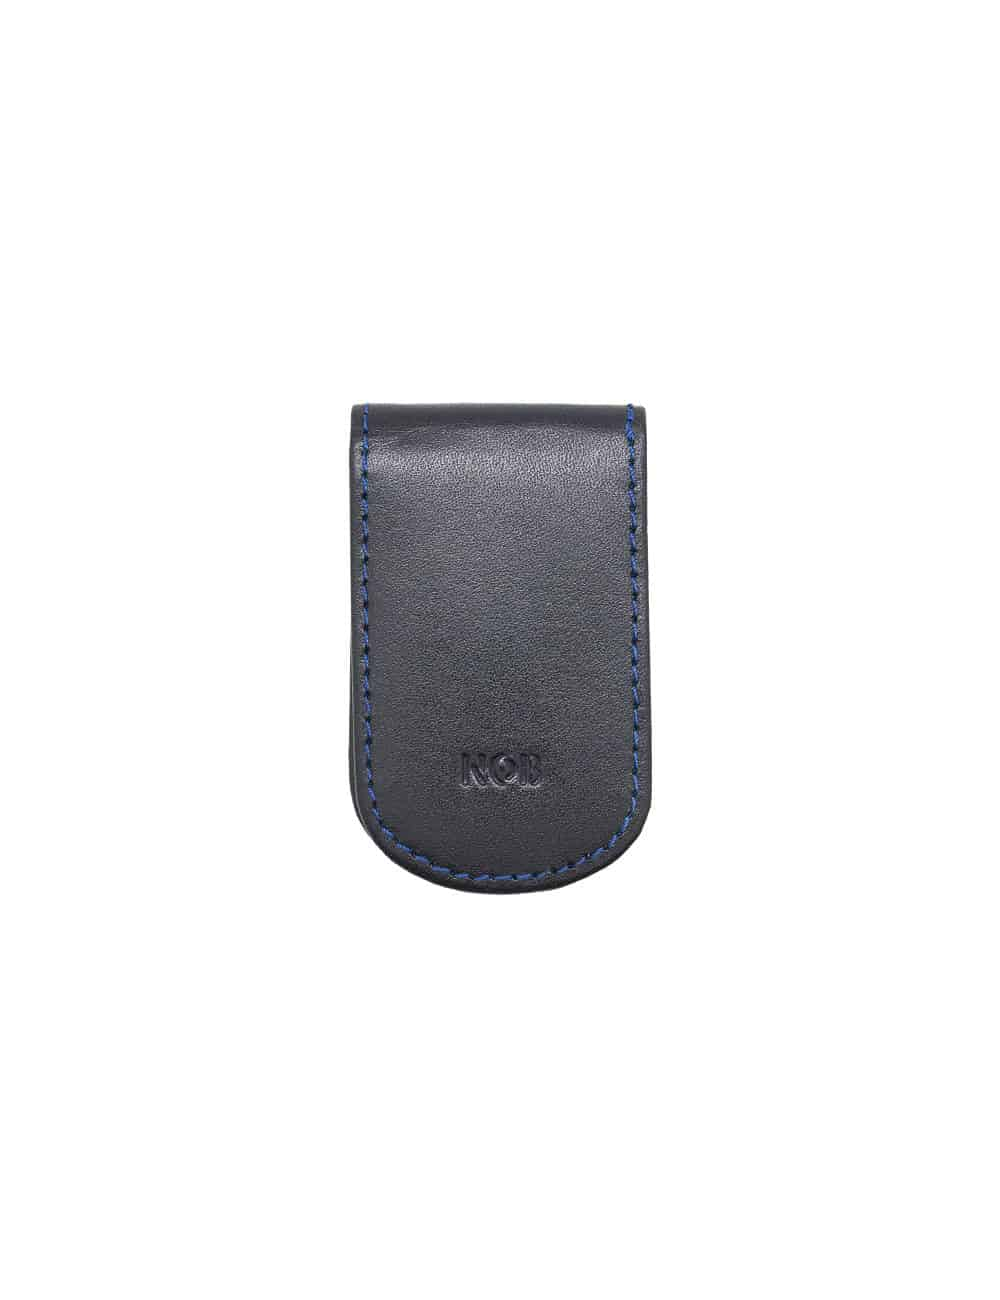 Navy 100% Genuine Top Grain Leather Money Clip SLG2.NOB1